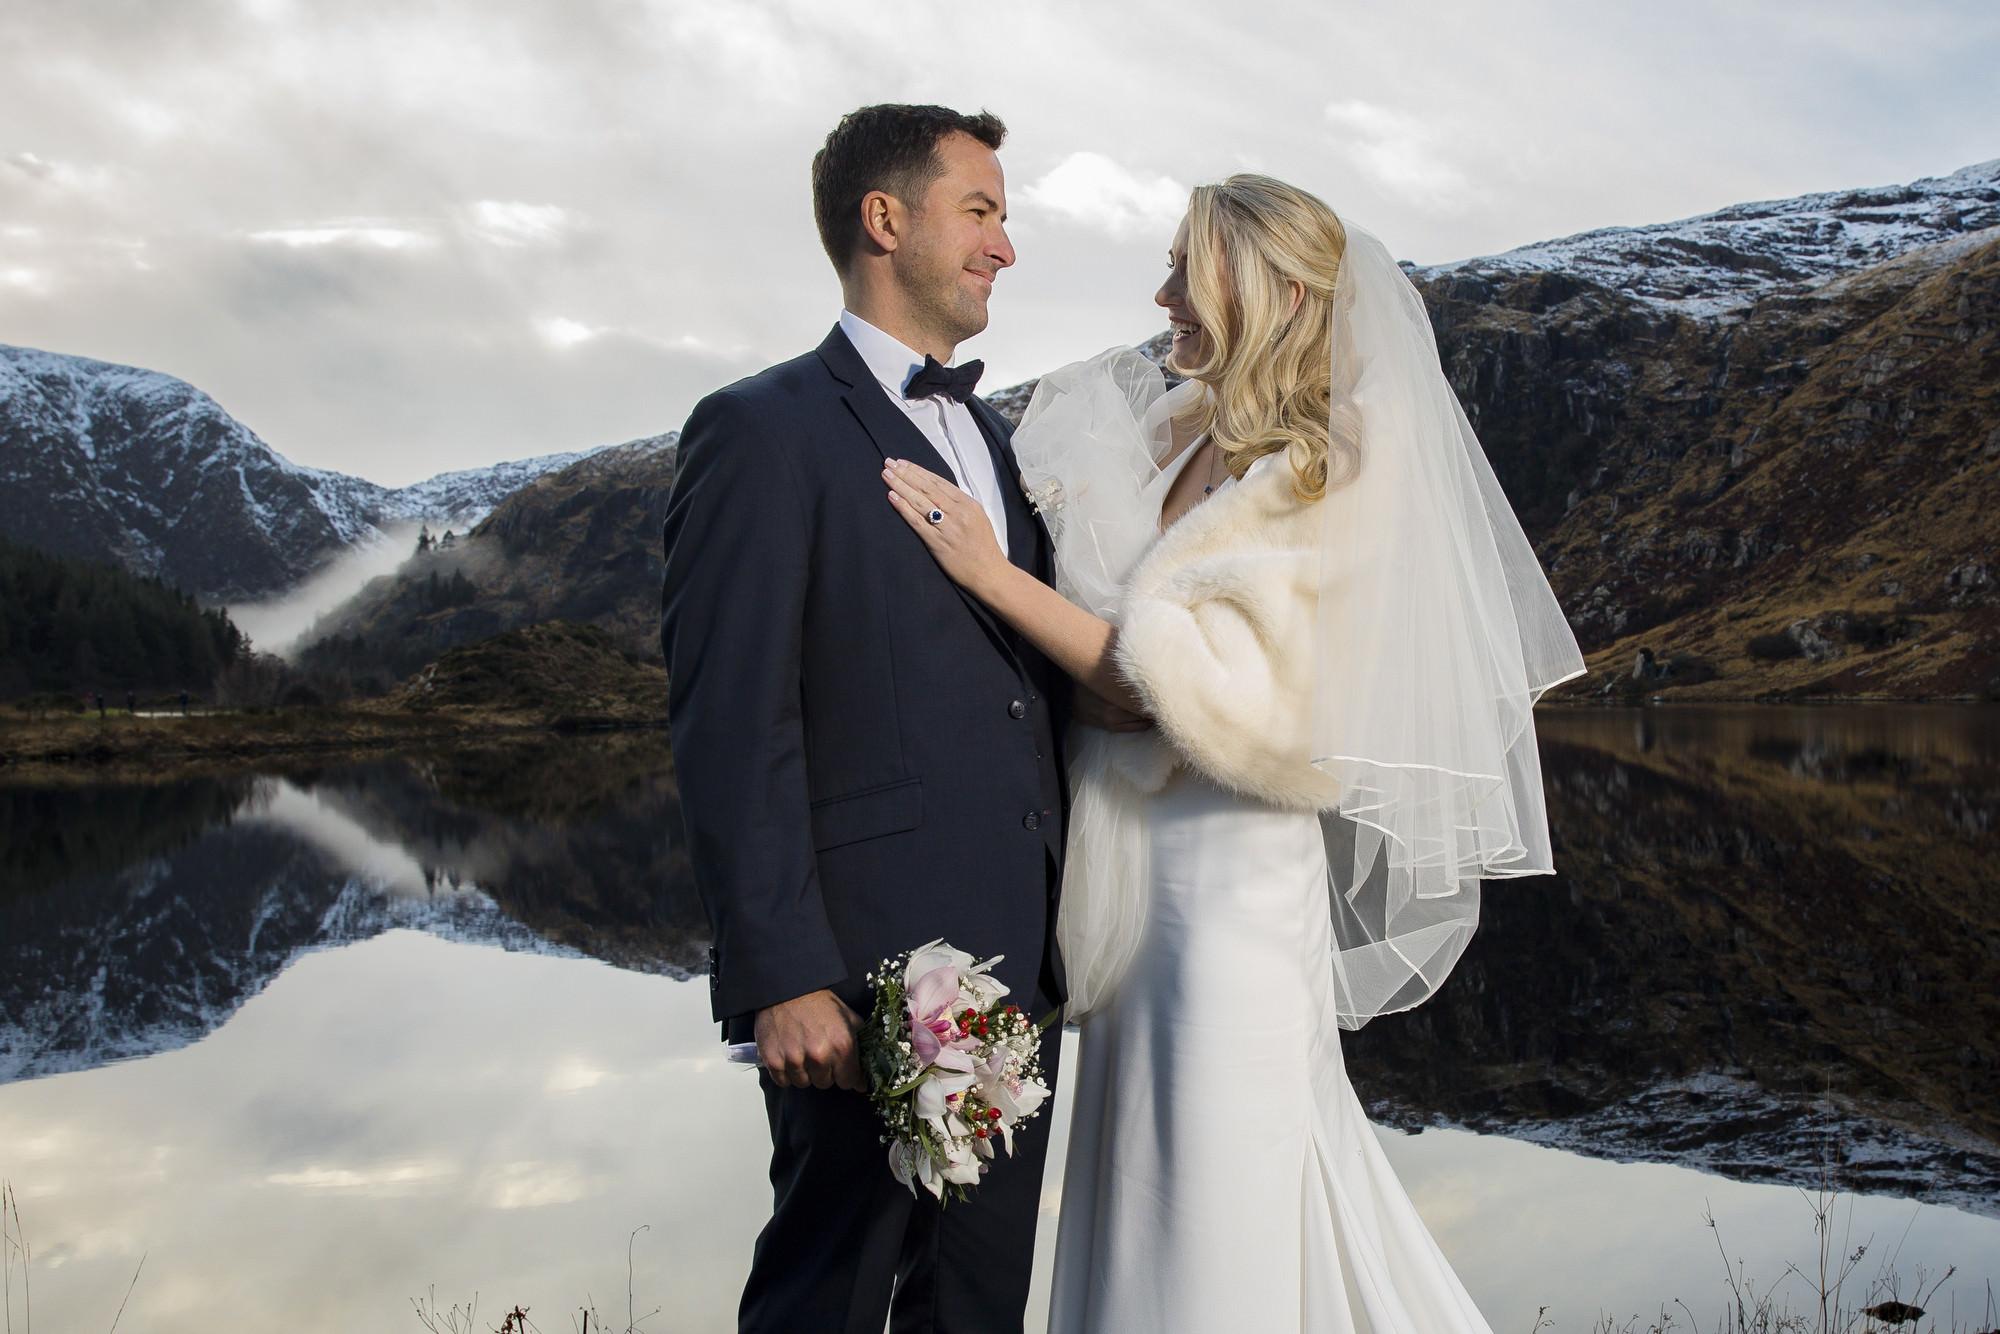 muckross_park_hotel_grougane_barra_wedding_photographer_goldenmoments_047.jpg